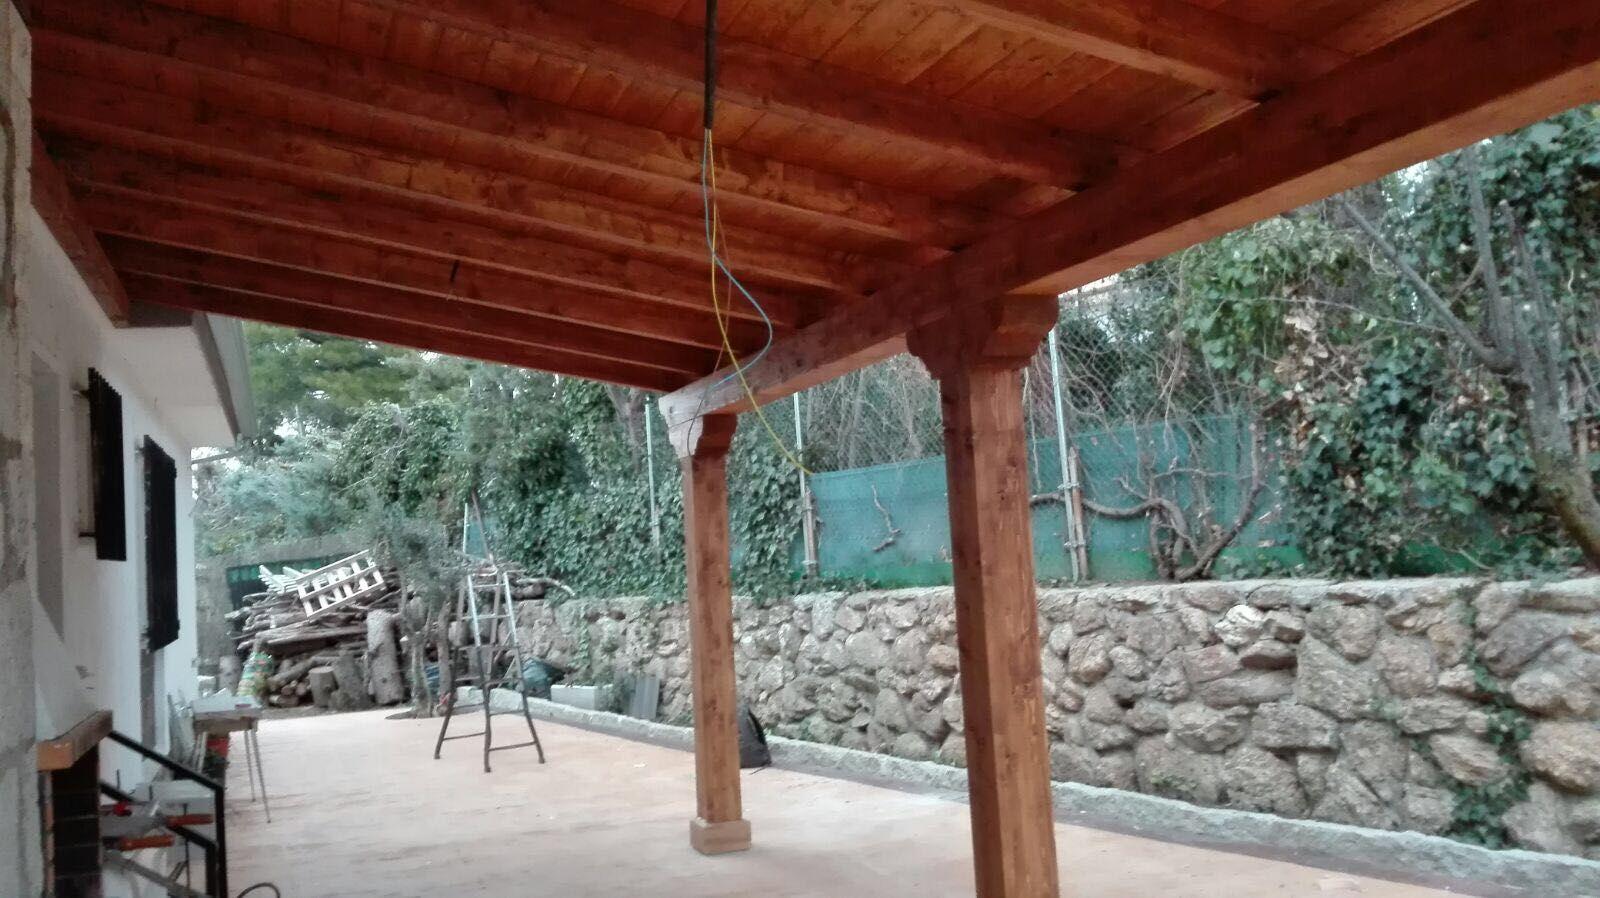 Cenadores para jardín en Villaviciosa de Odón